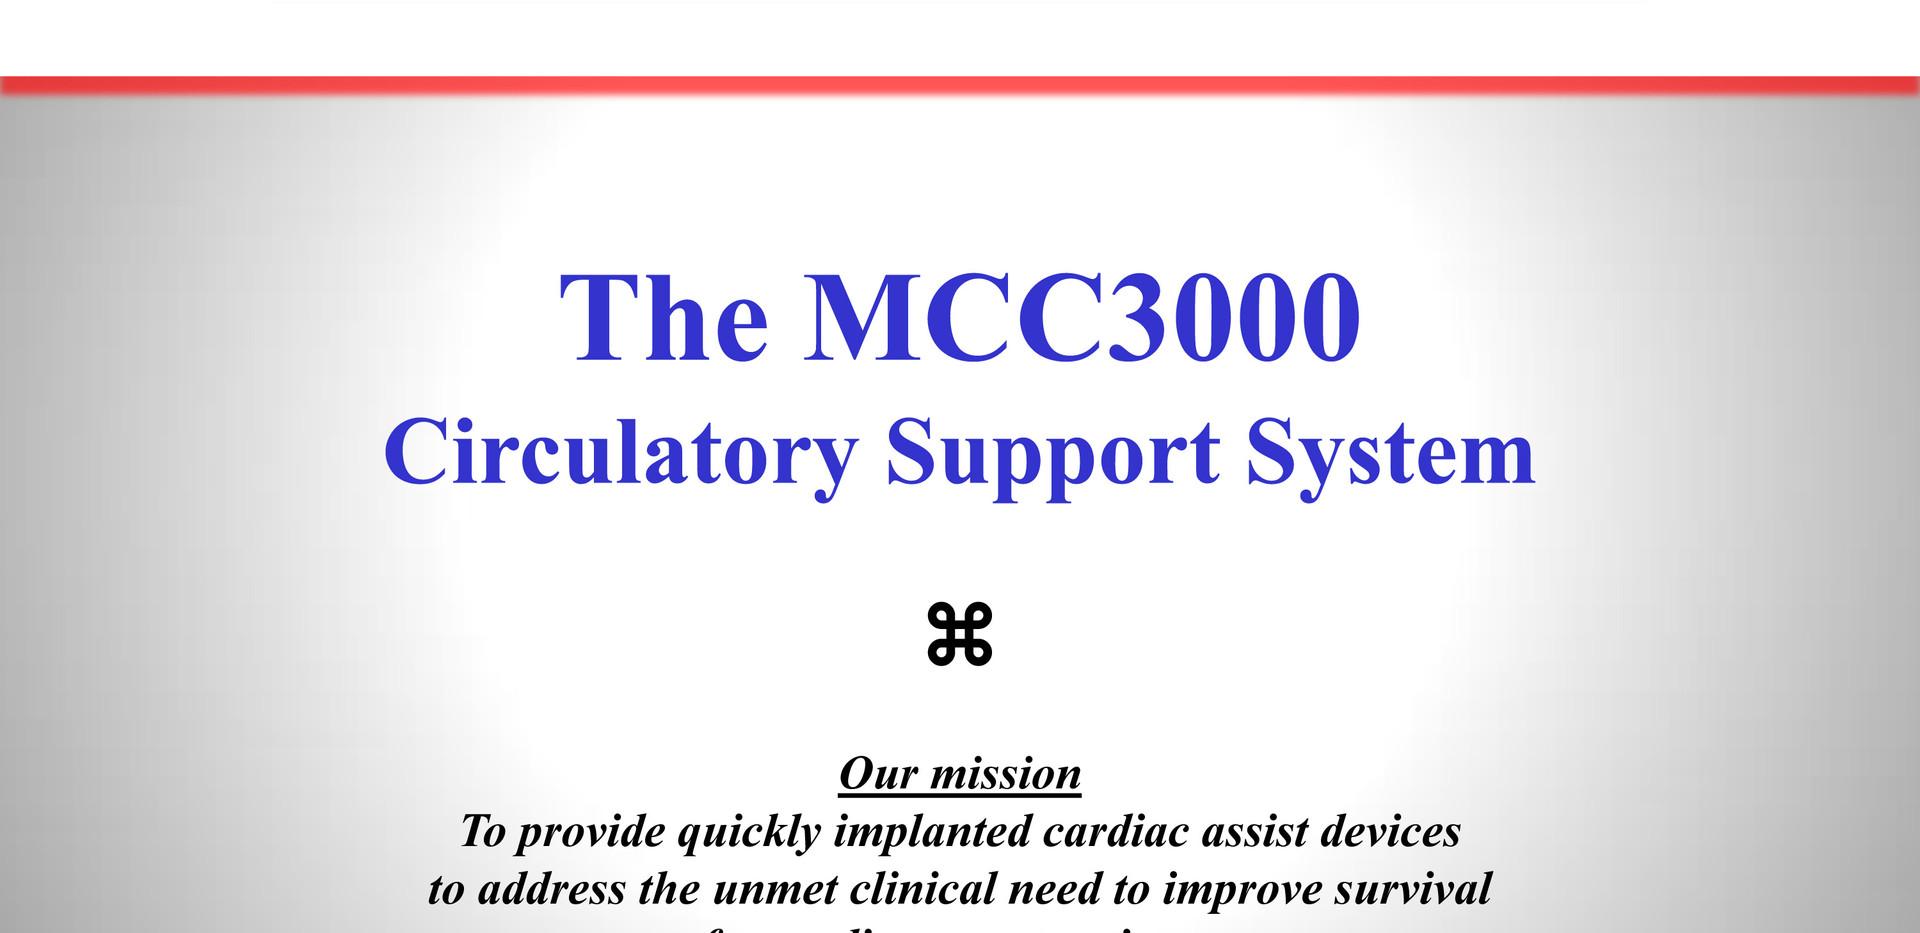 MCC pp April 2014 - PDF-1.jpg